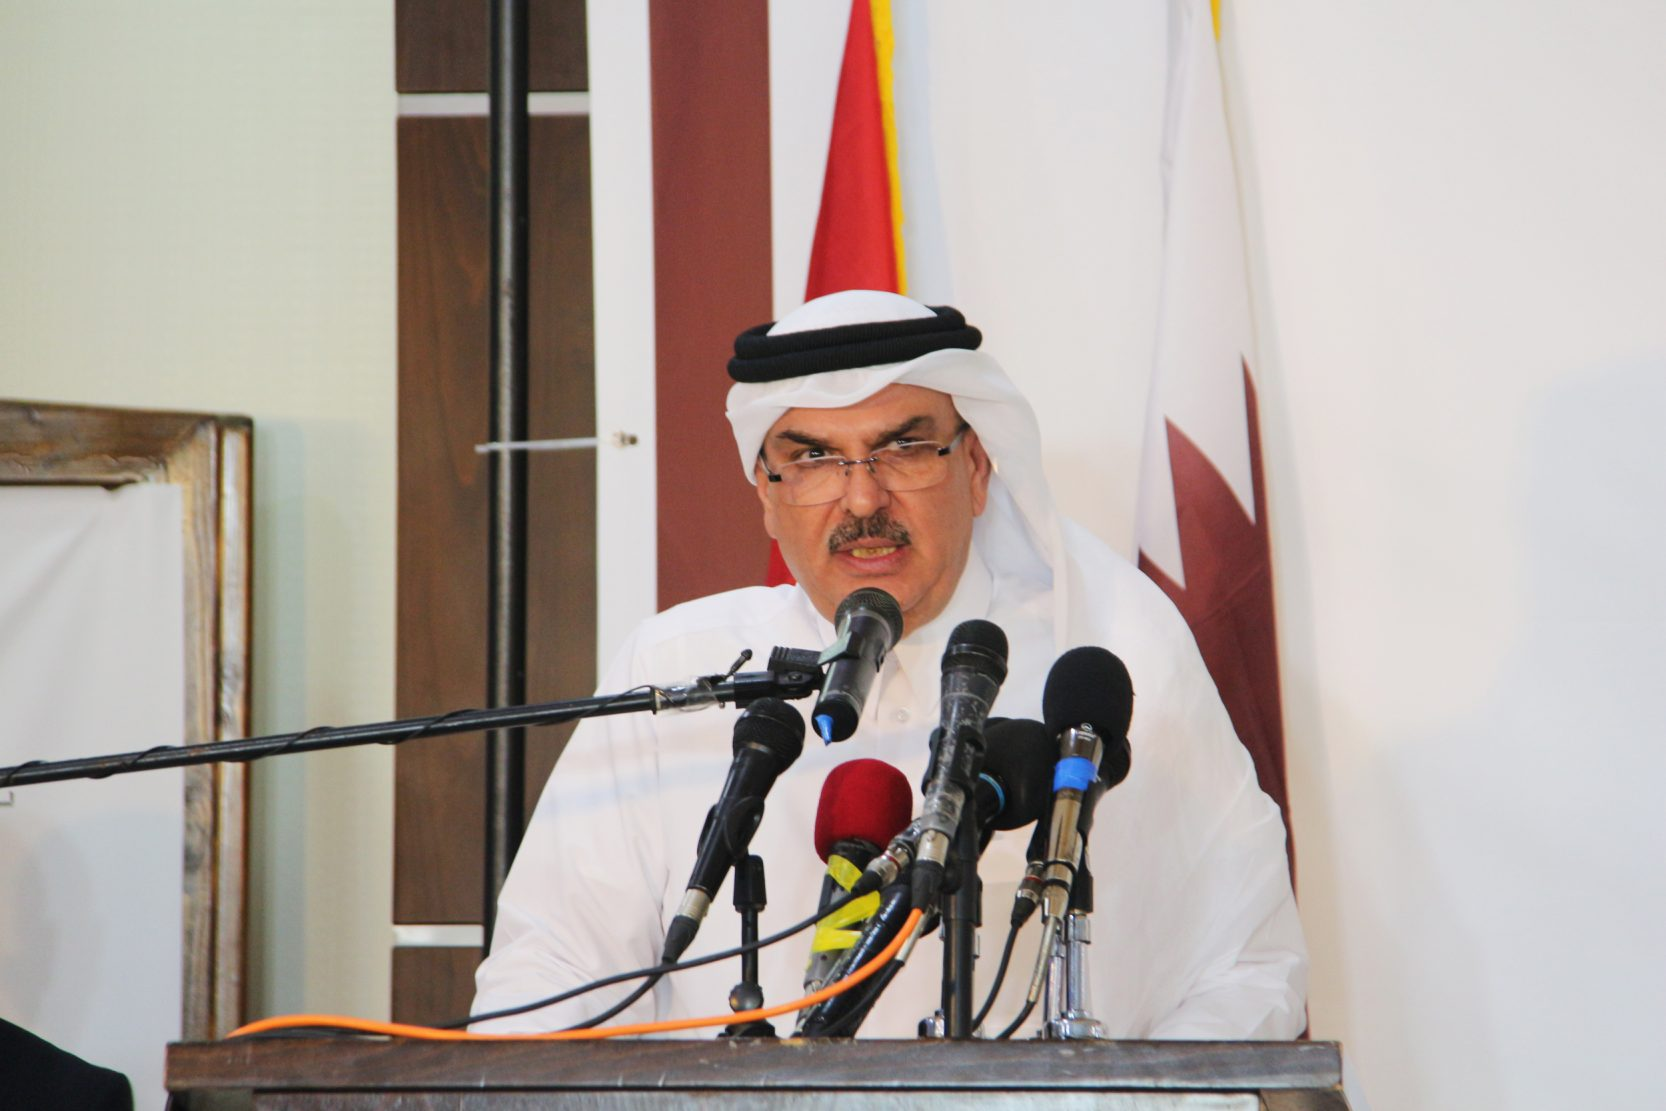 Ambassador Al Emadi Announces Agreement on Qatari Grant, Opening of Gaza Crossings